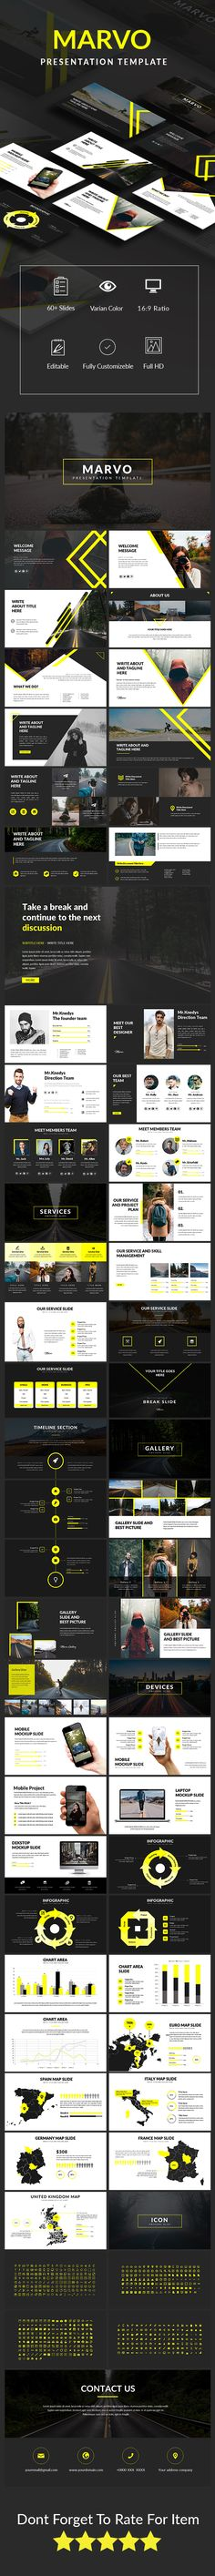 Marvo Presentation Template - PowerPoint Templates Presentation Templates